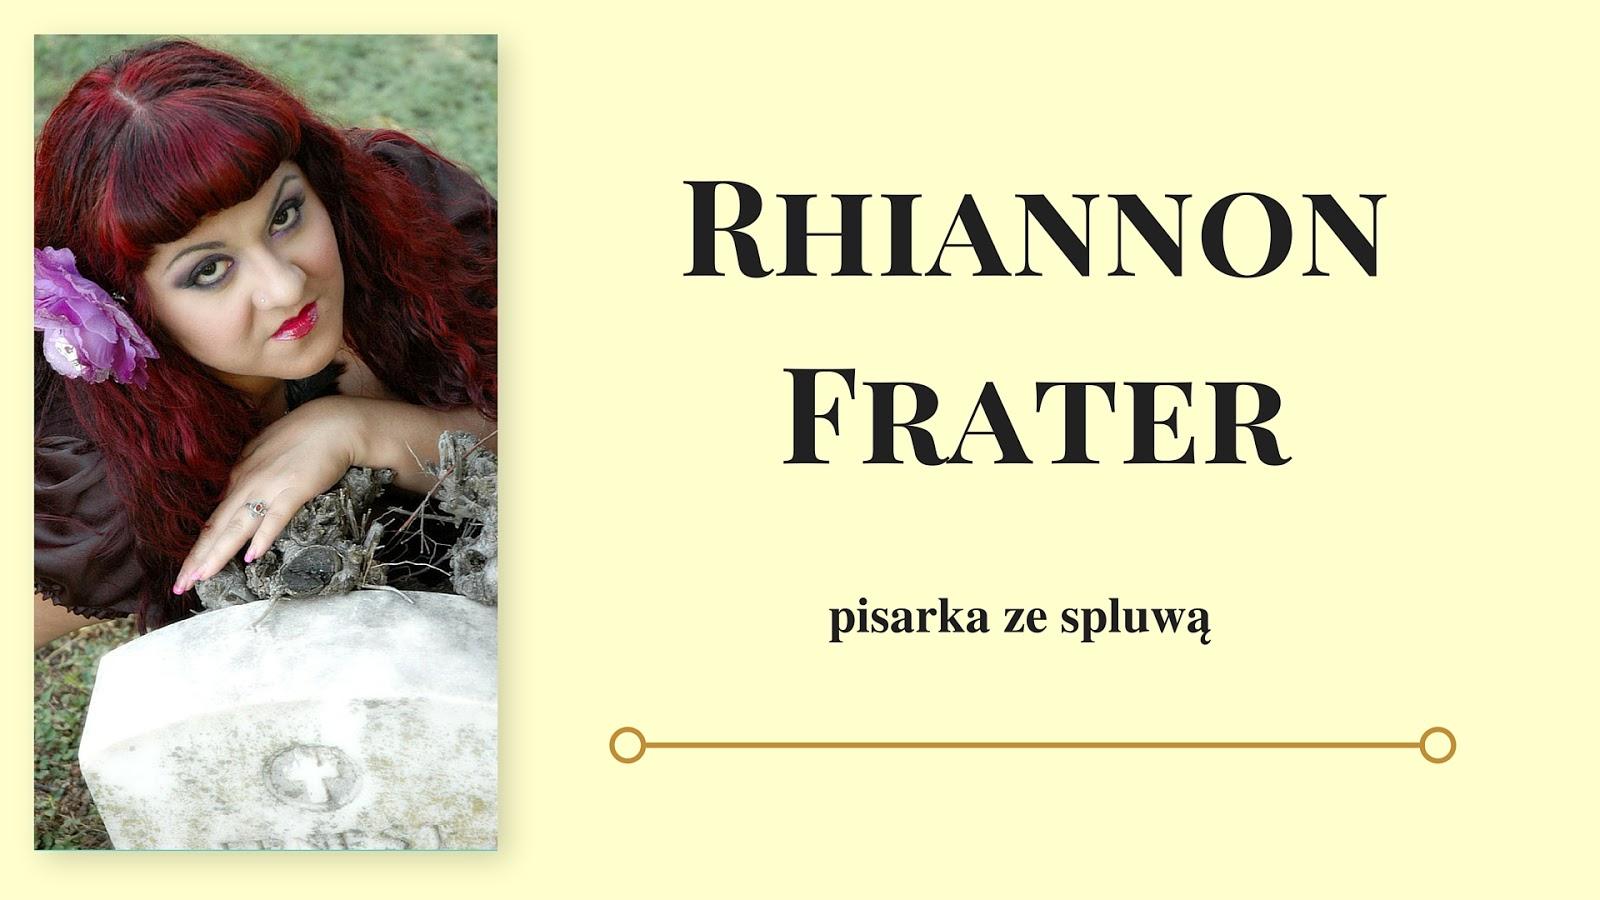 Rhiannon Frater- wywiad & konkurs!